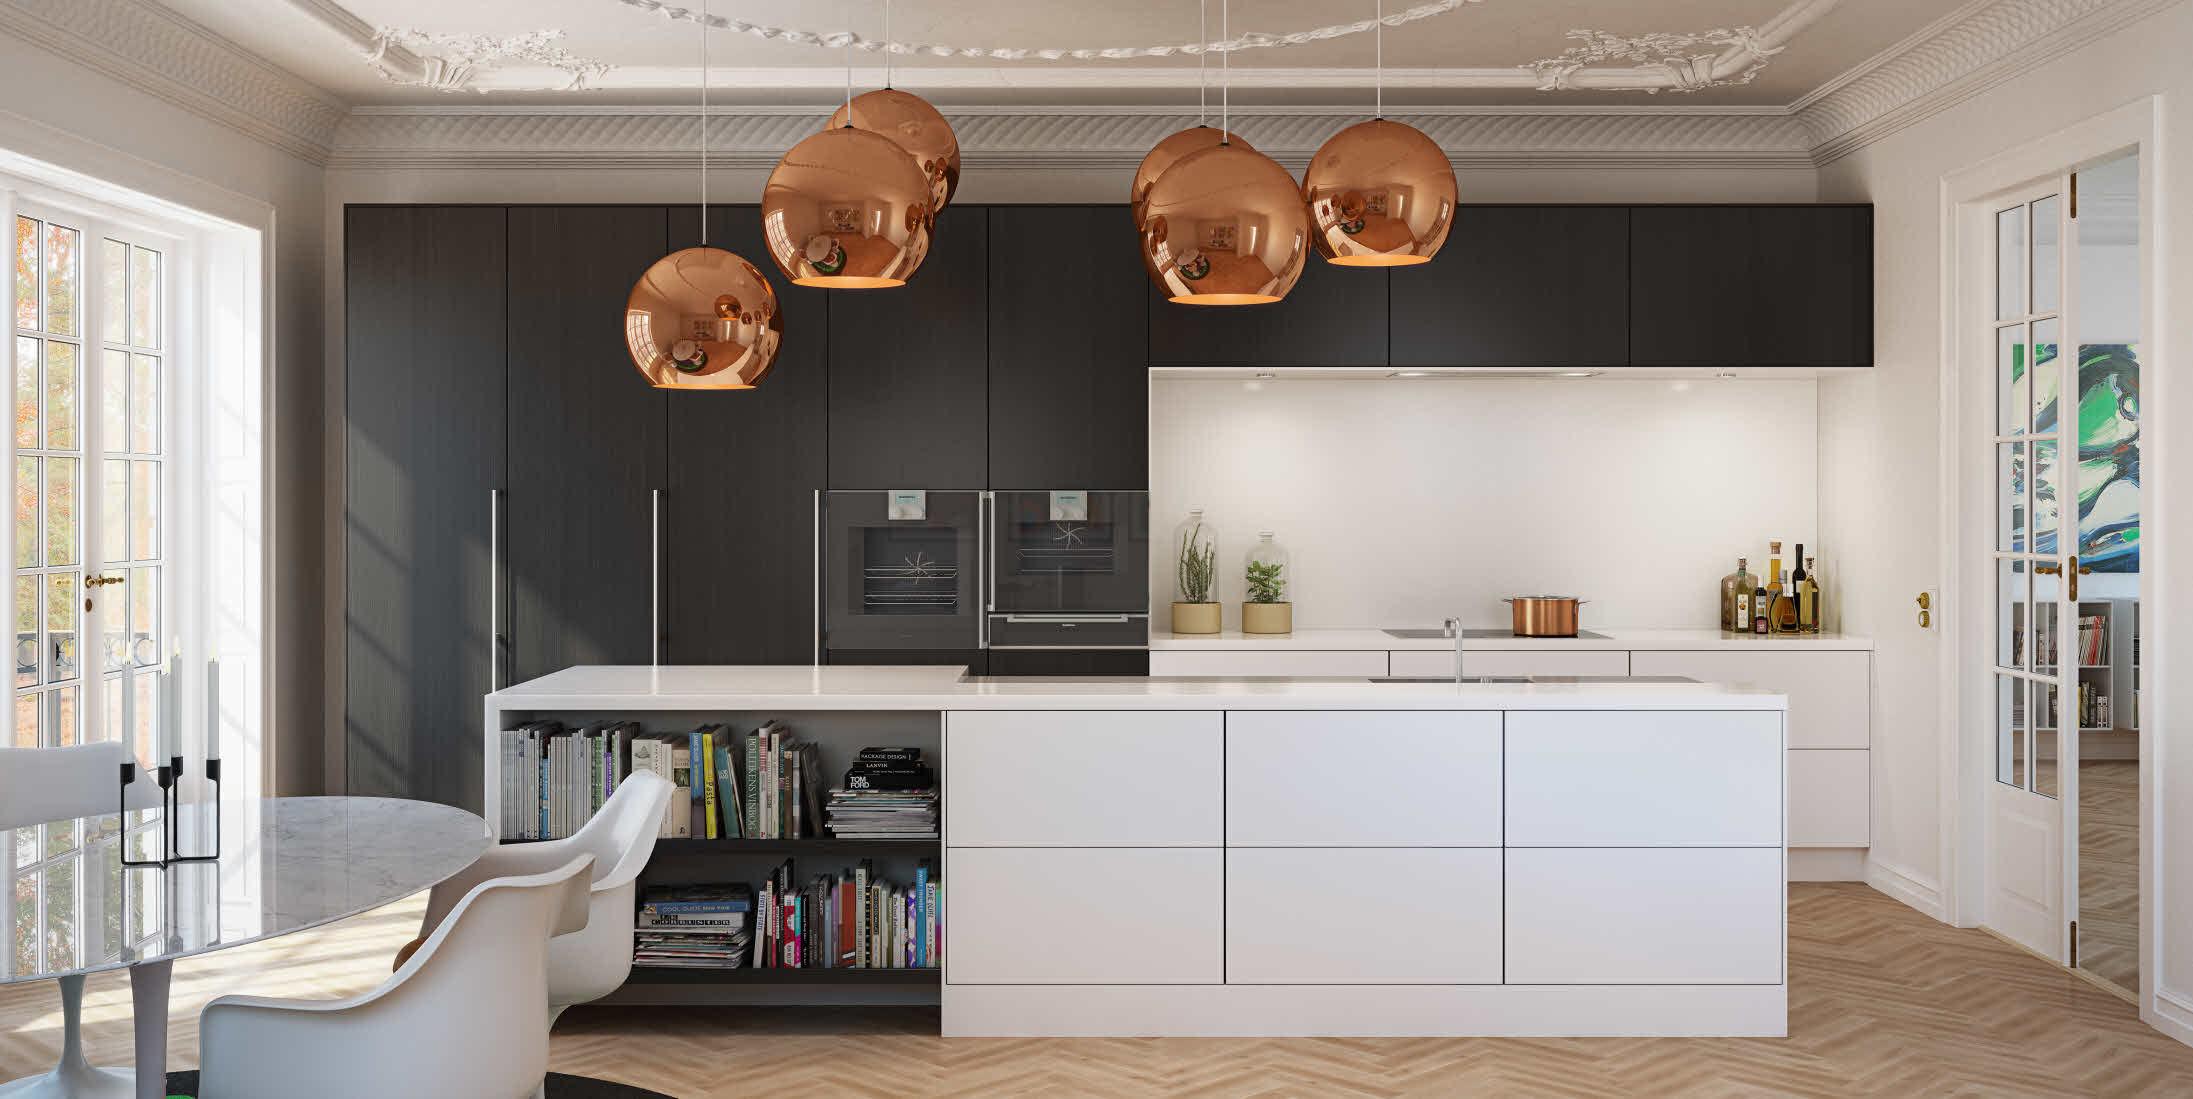 Küche G Form | Jtleigh.com - Hausgestaltung Ideen | {Moderne küchen g form 49}